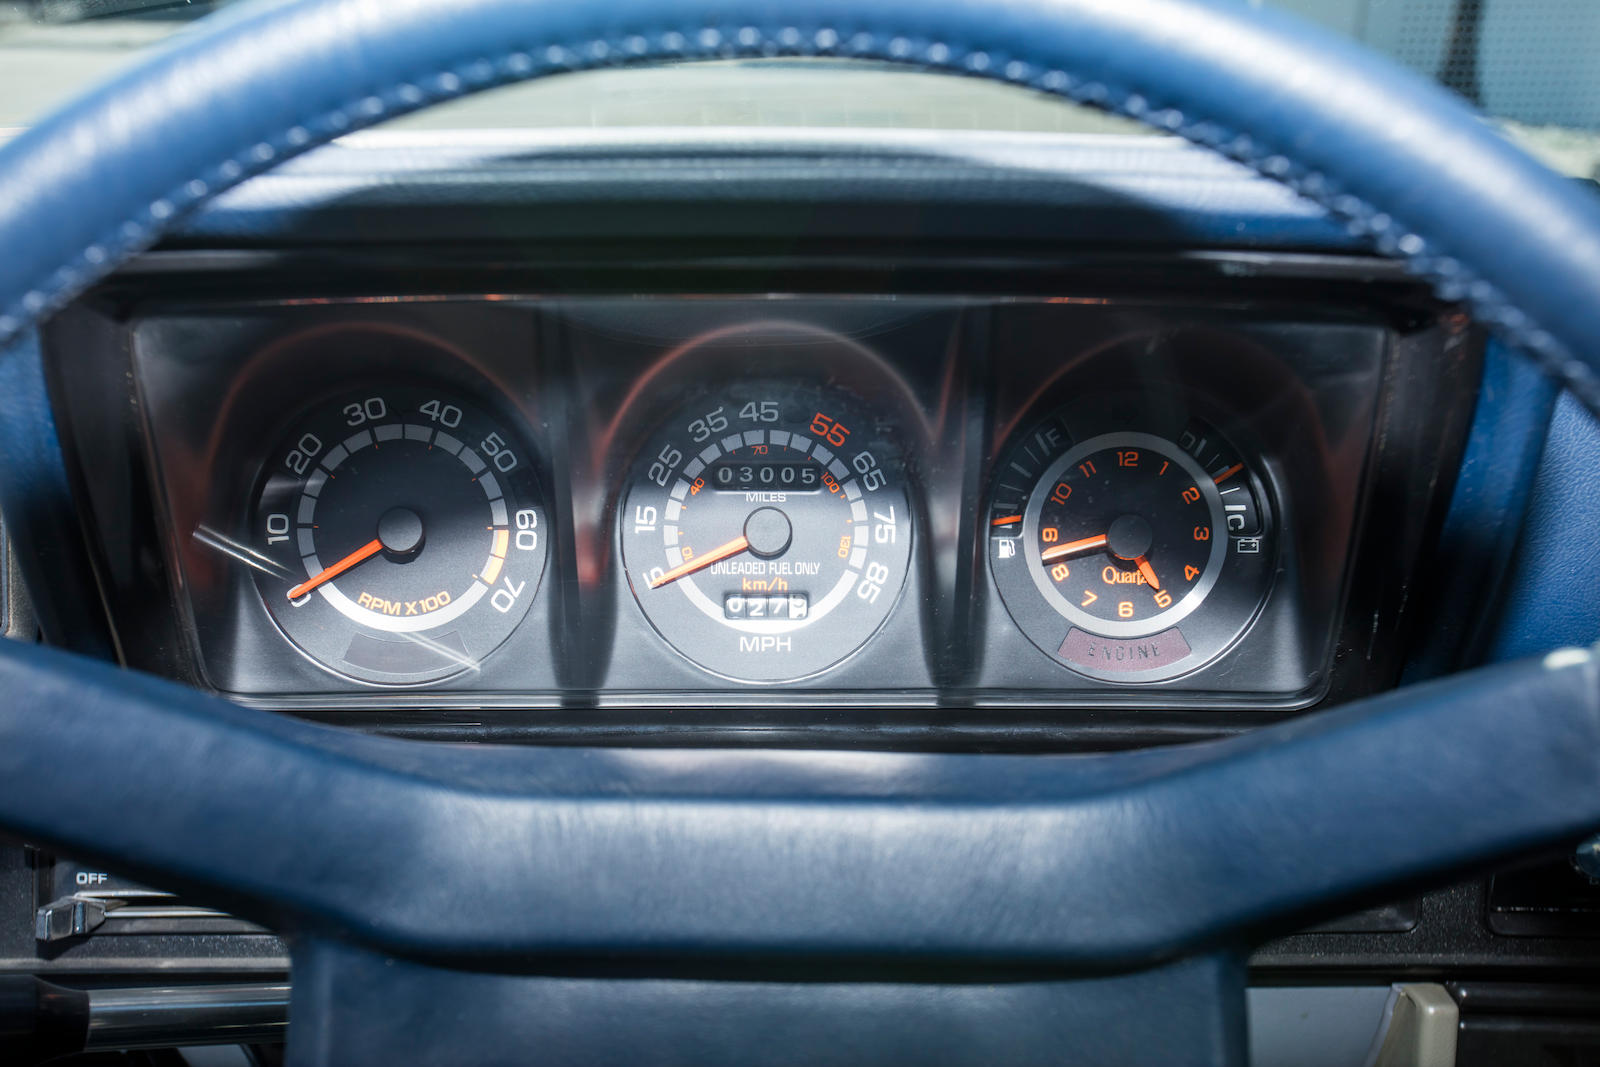 1983 Dodge Shelby Charger gauges